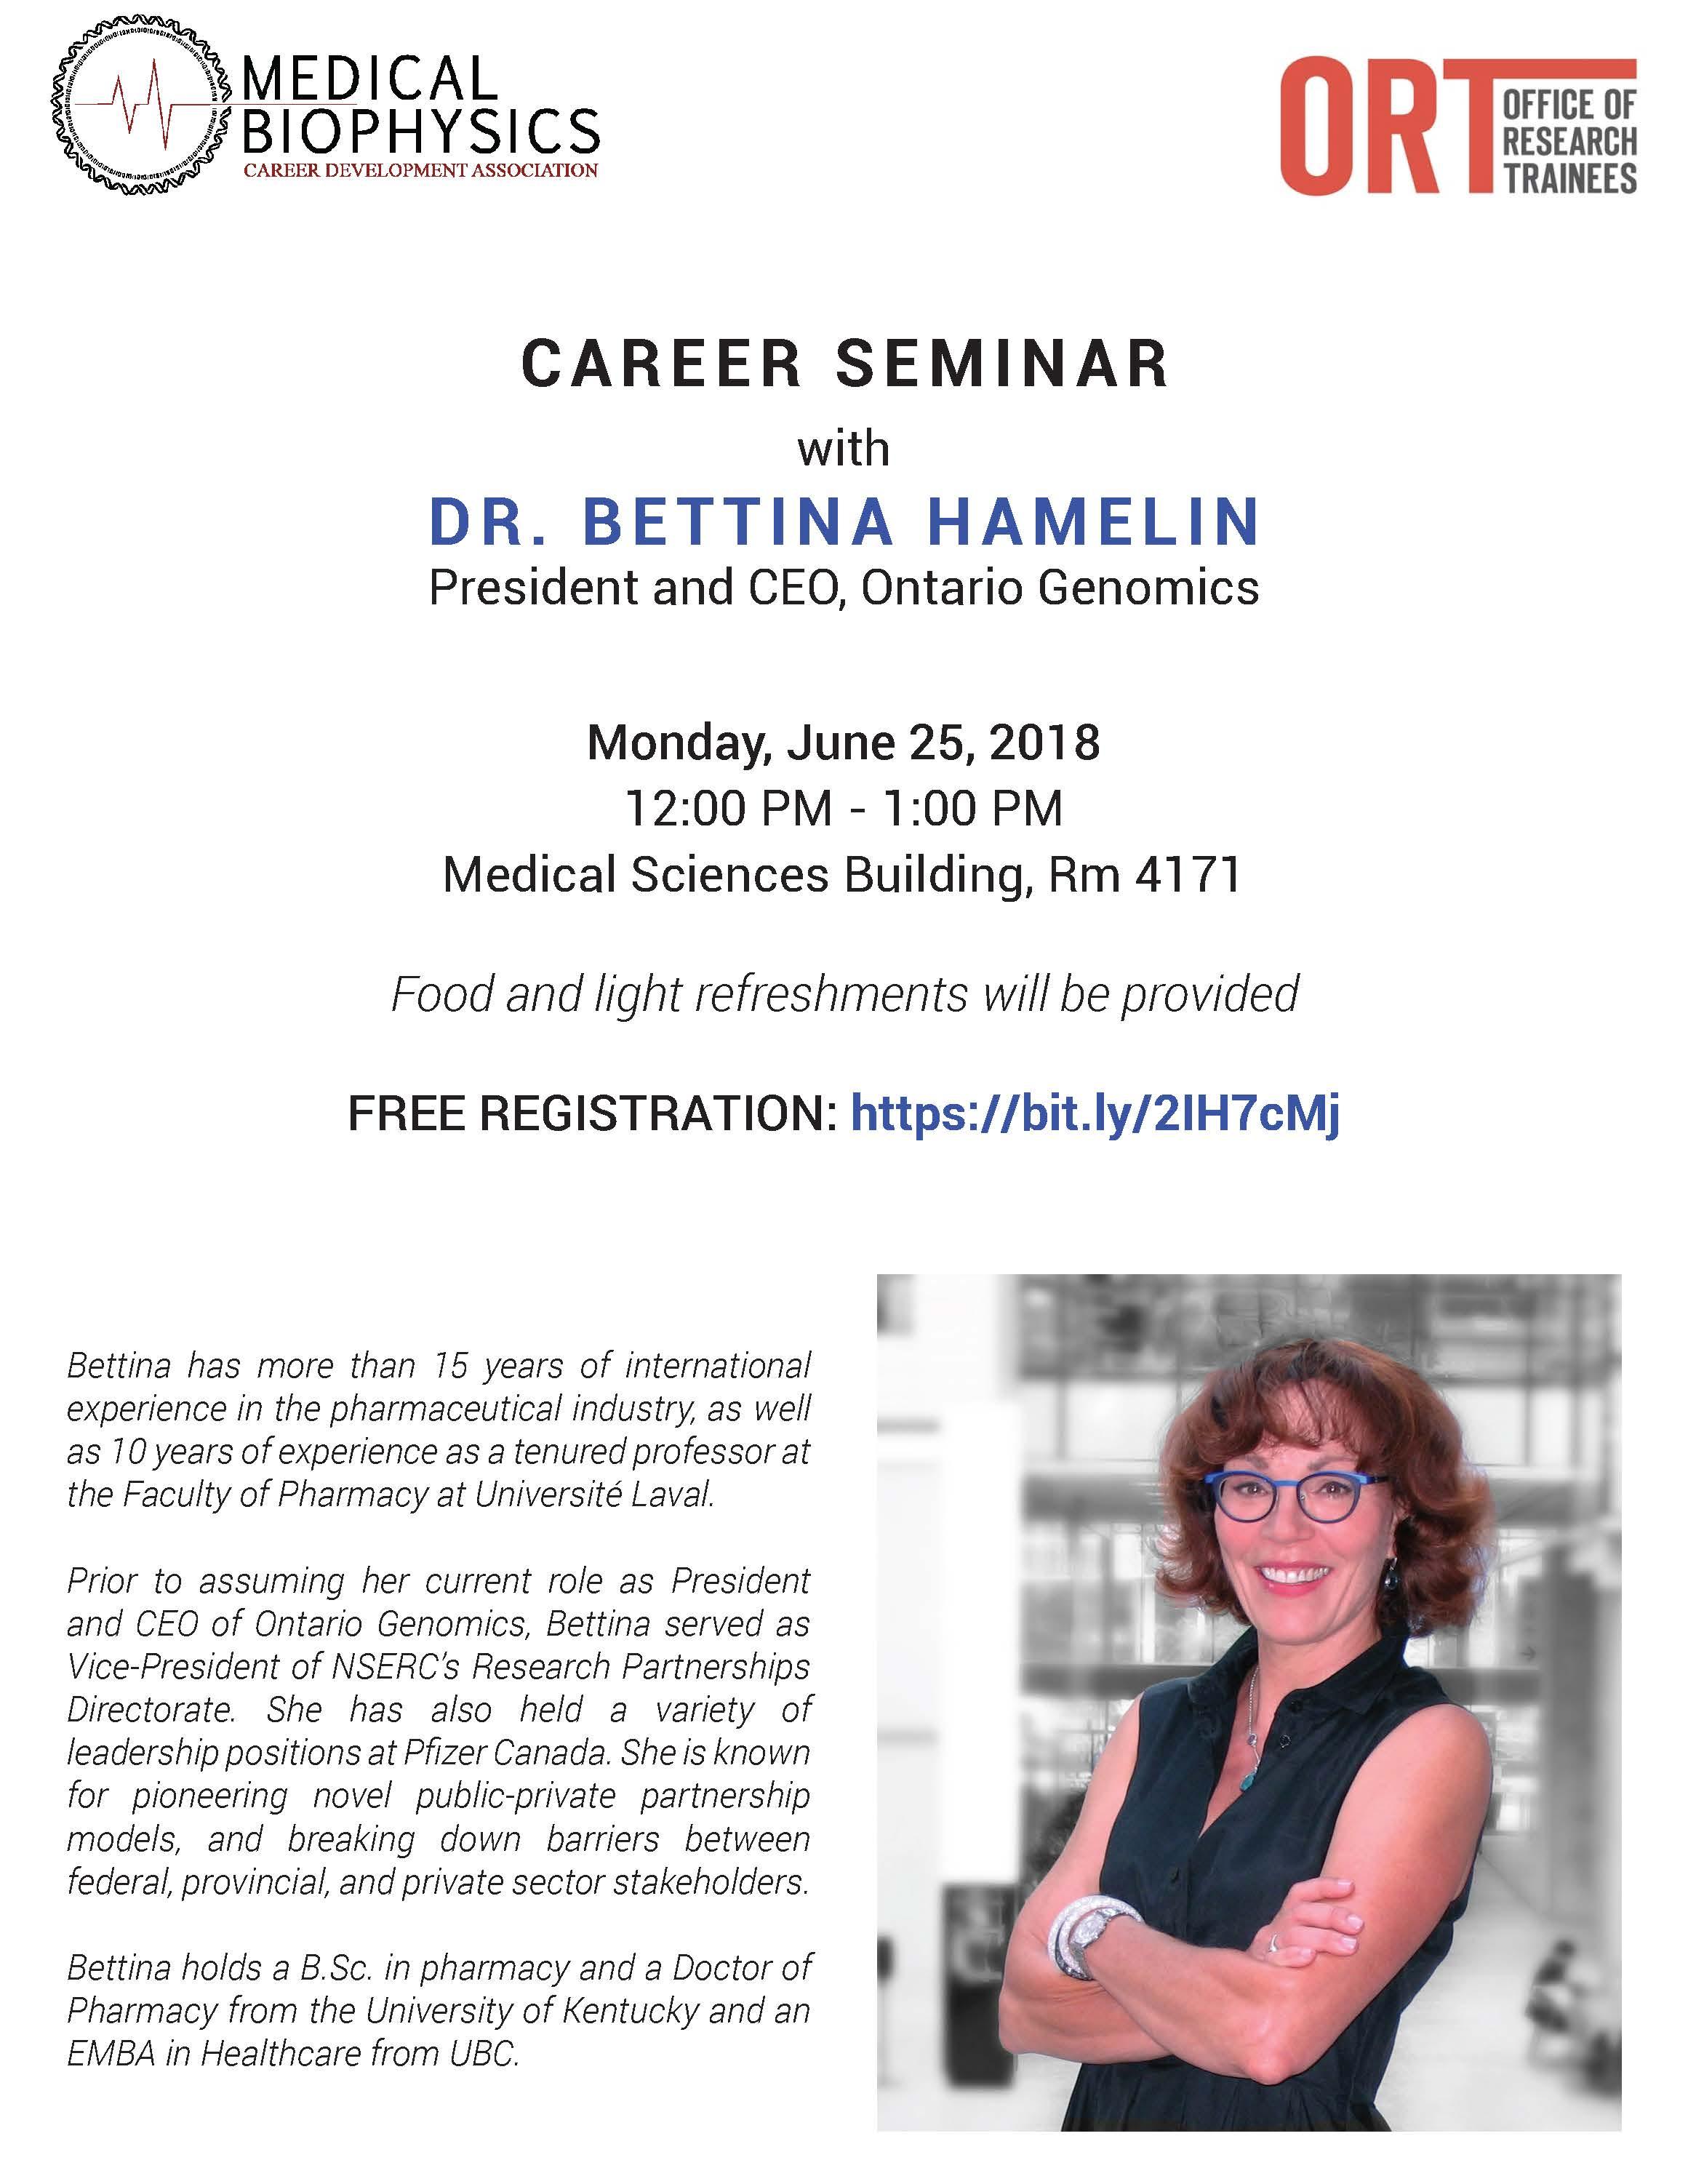 Career Seminar with Dr  Bettina Hamelin (CEO and President